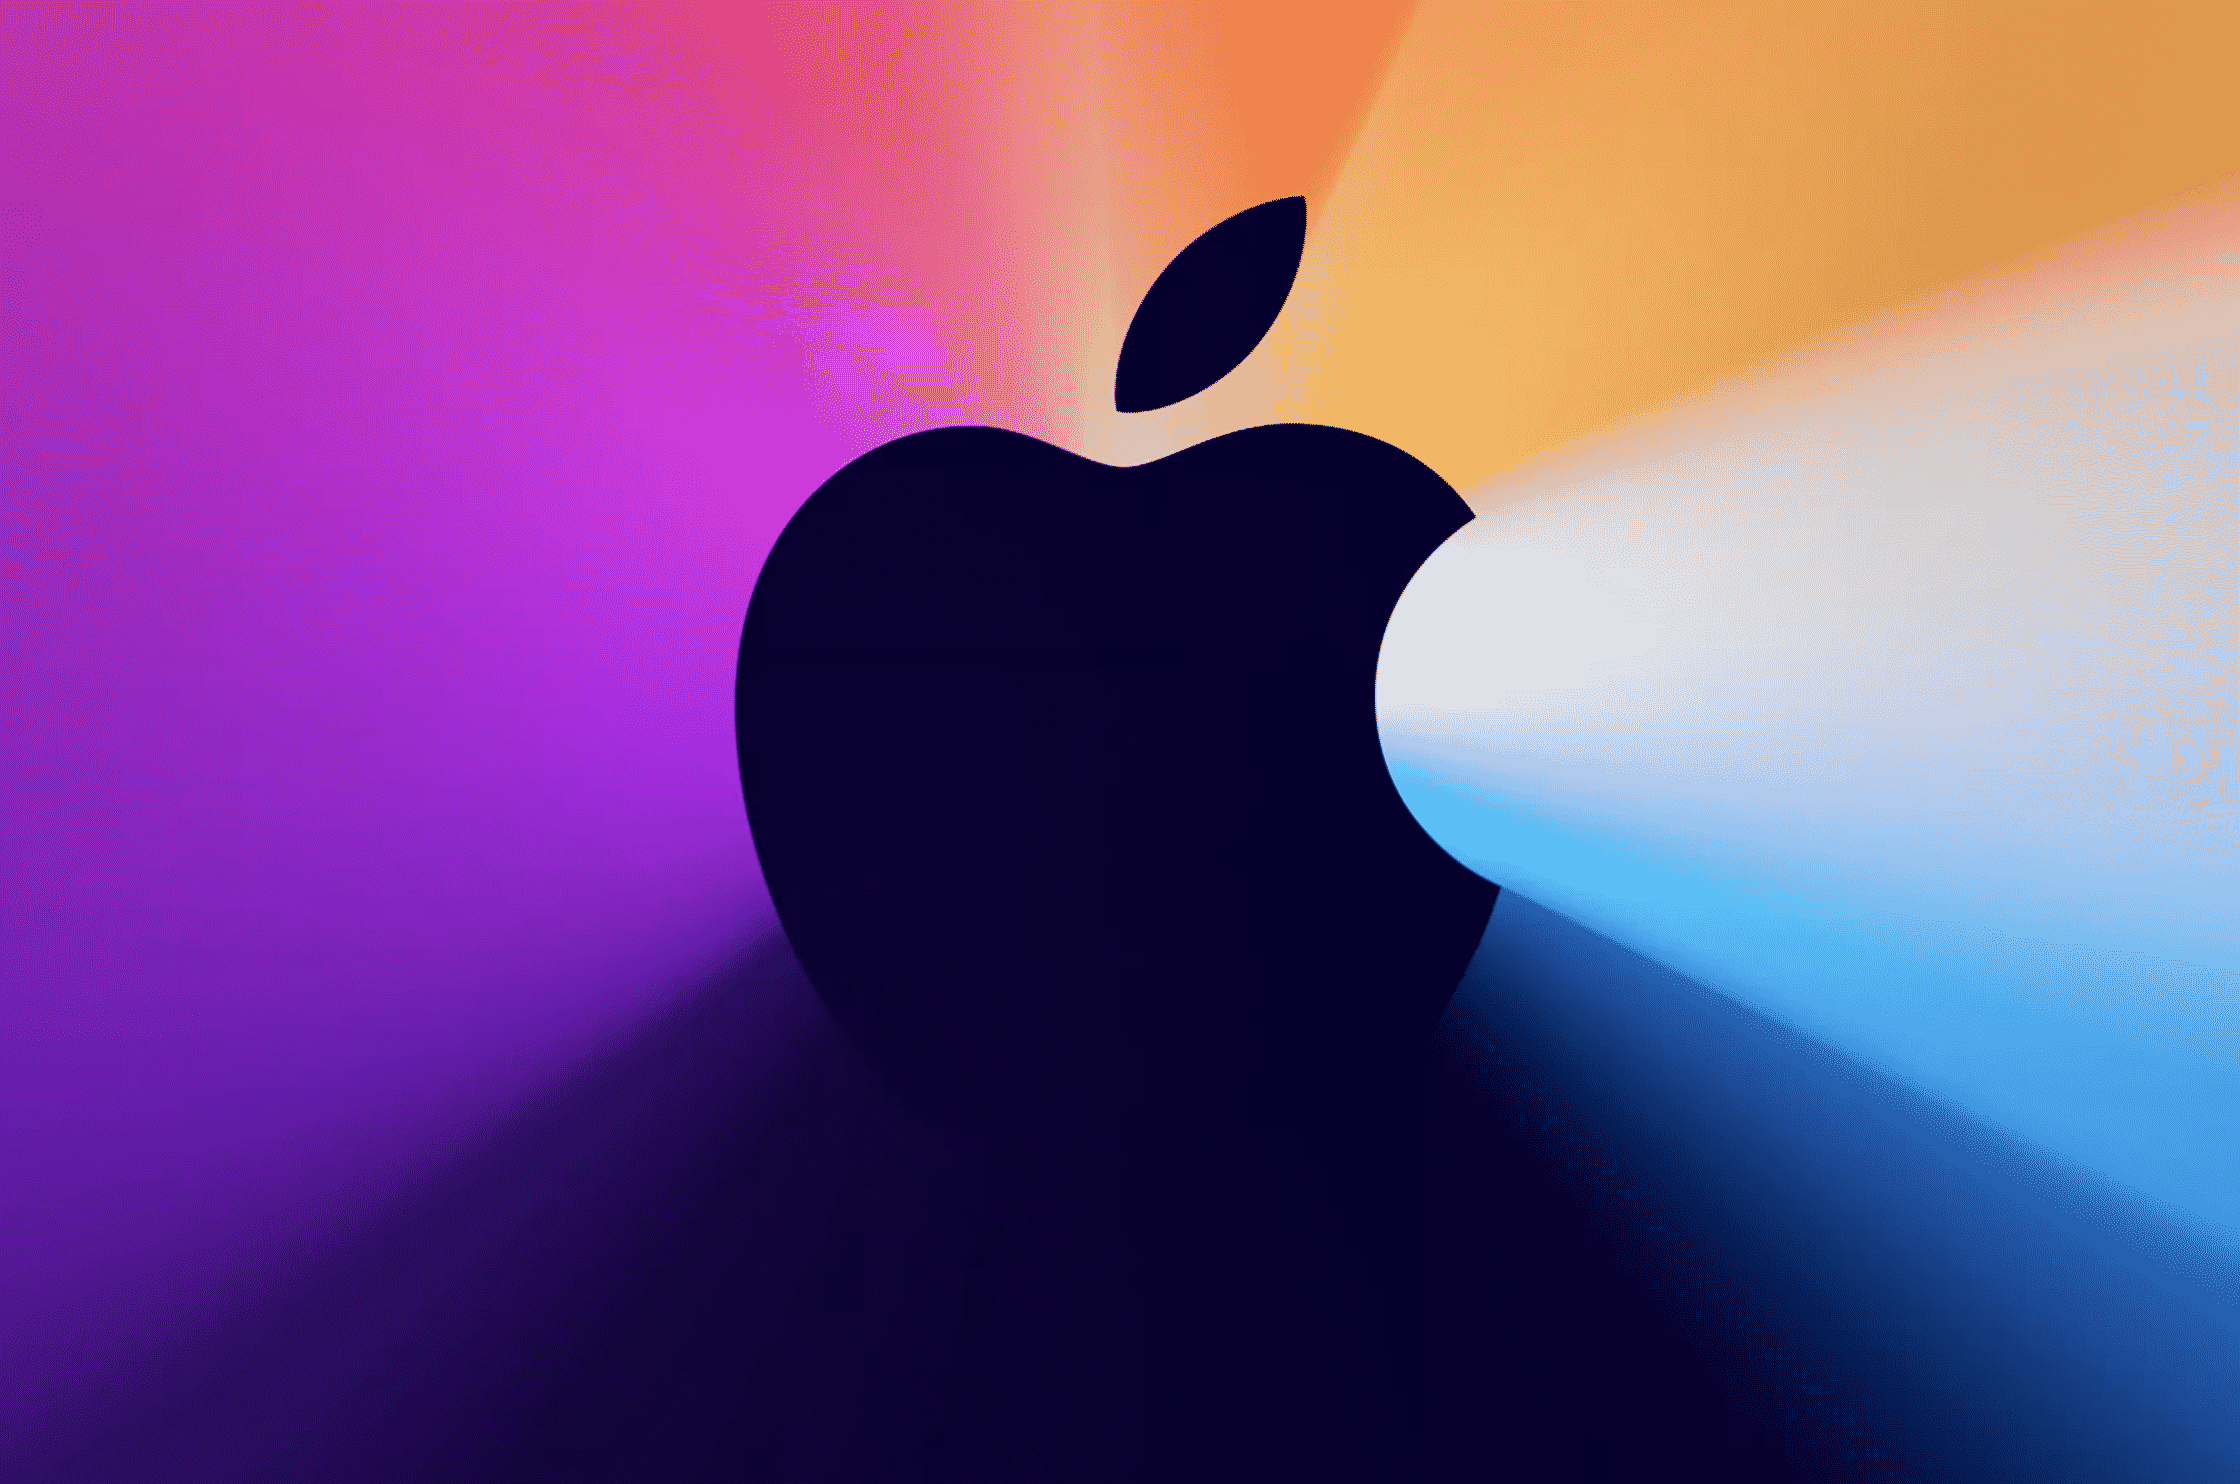 Apple event on November 10 2020